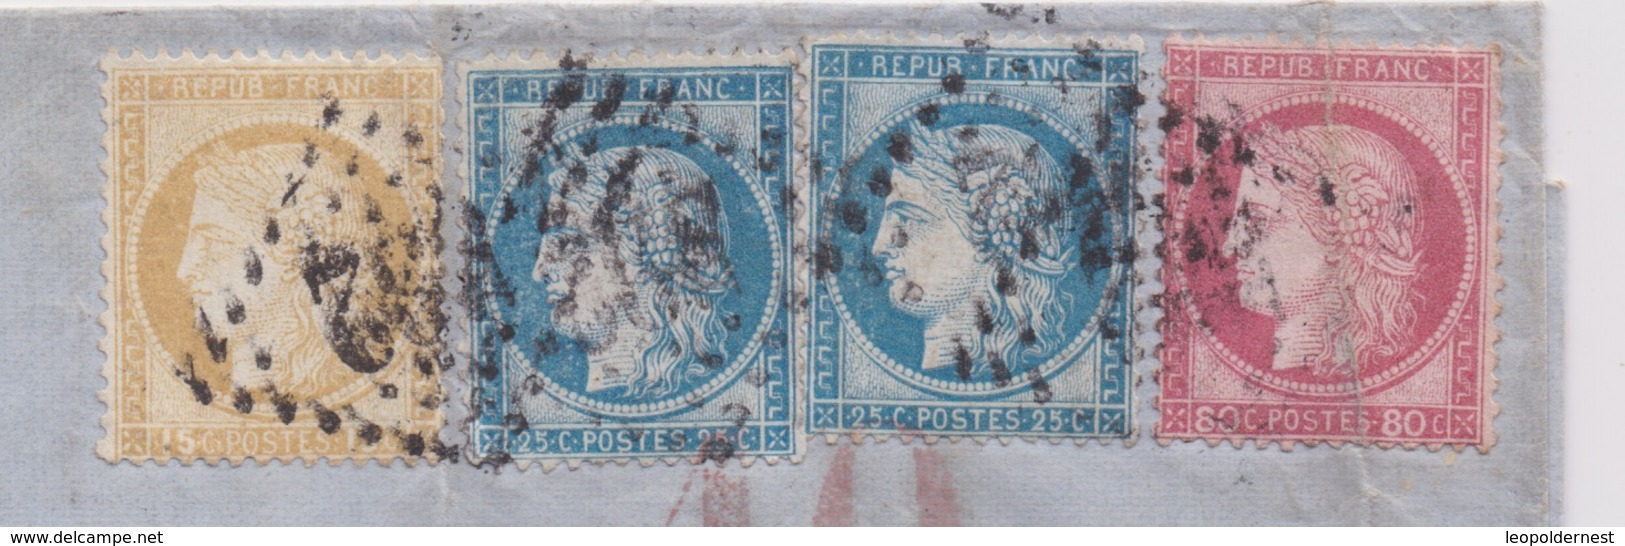 FRANCE - CLASSIQUES : LETTRE Pour VALPARAISO, CHILI. N°53 + N° 55 + N°57 + N°60X2. - 1871-1875 Cérès